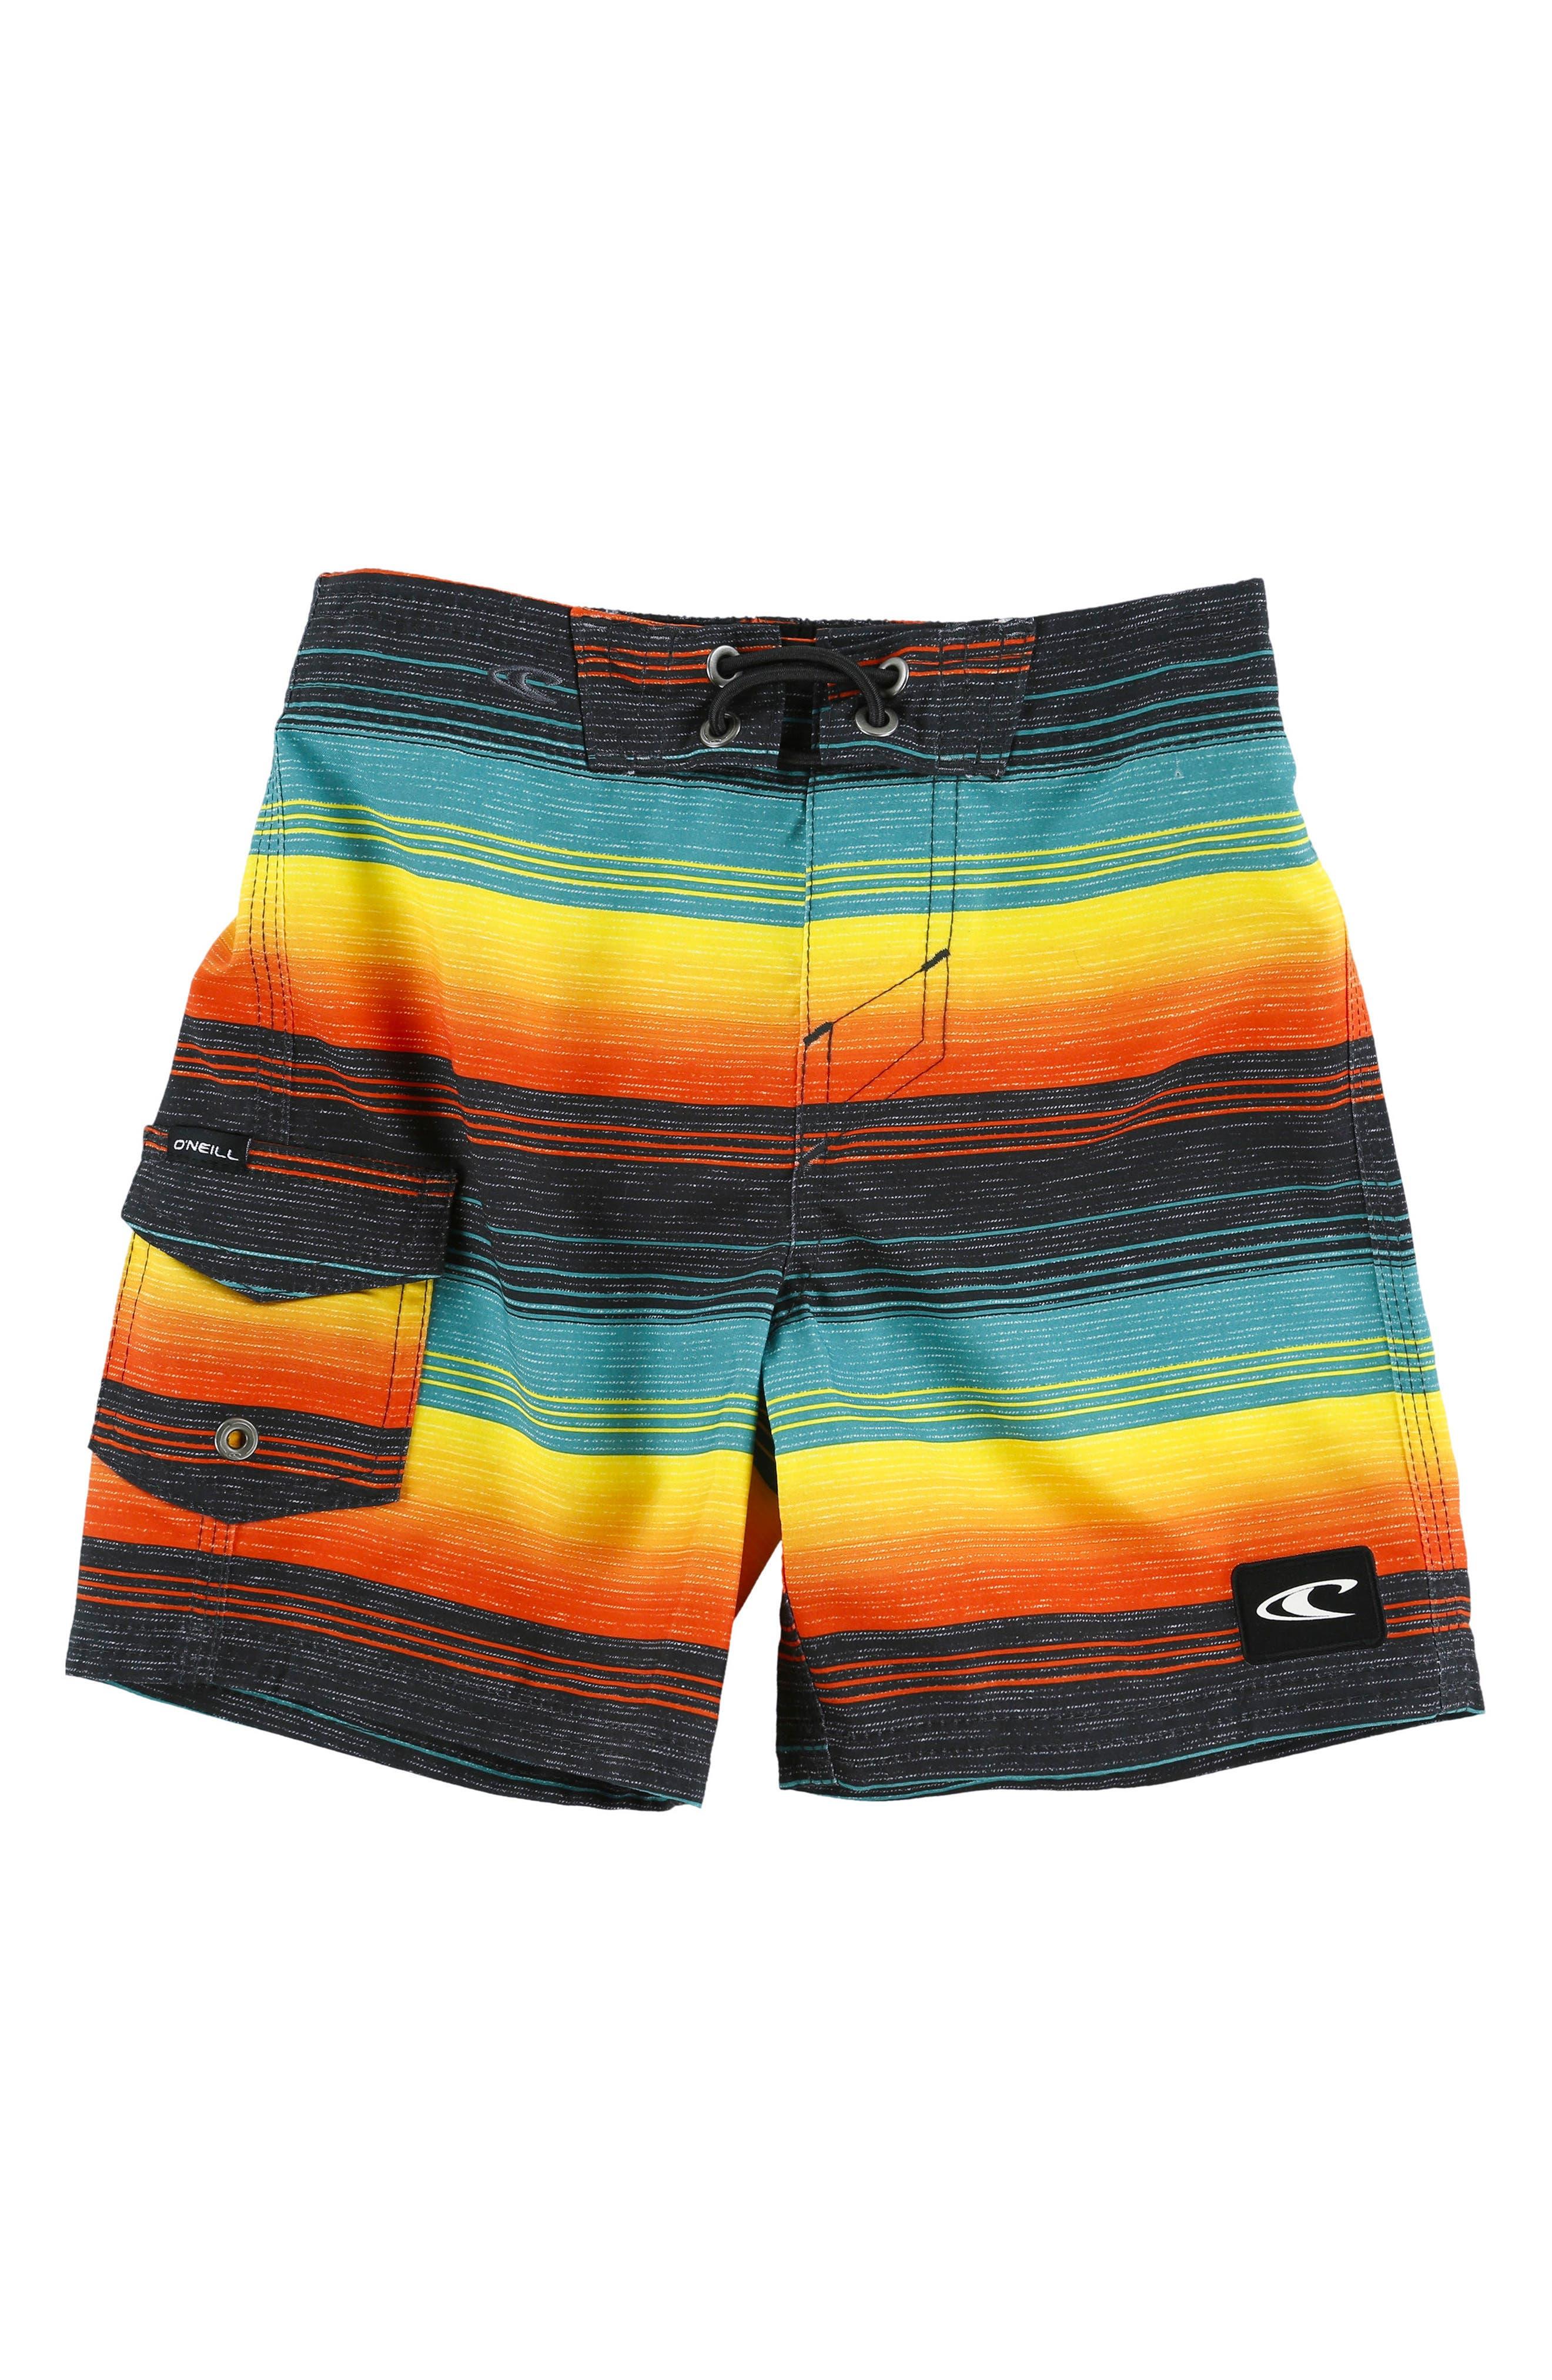 Alternate Image 1 Selected - O'Neill Santa Cruz Stripe Board Shorts (Little Boys & Big Boys)